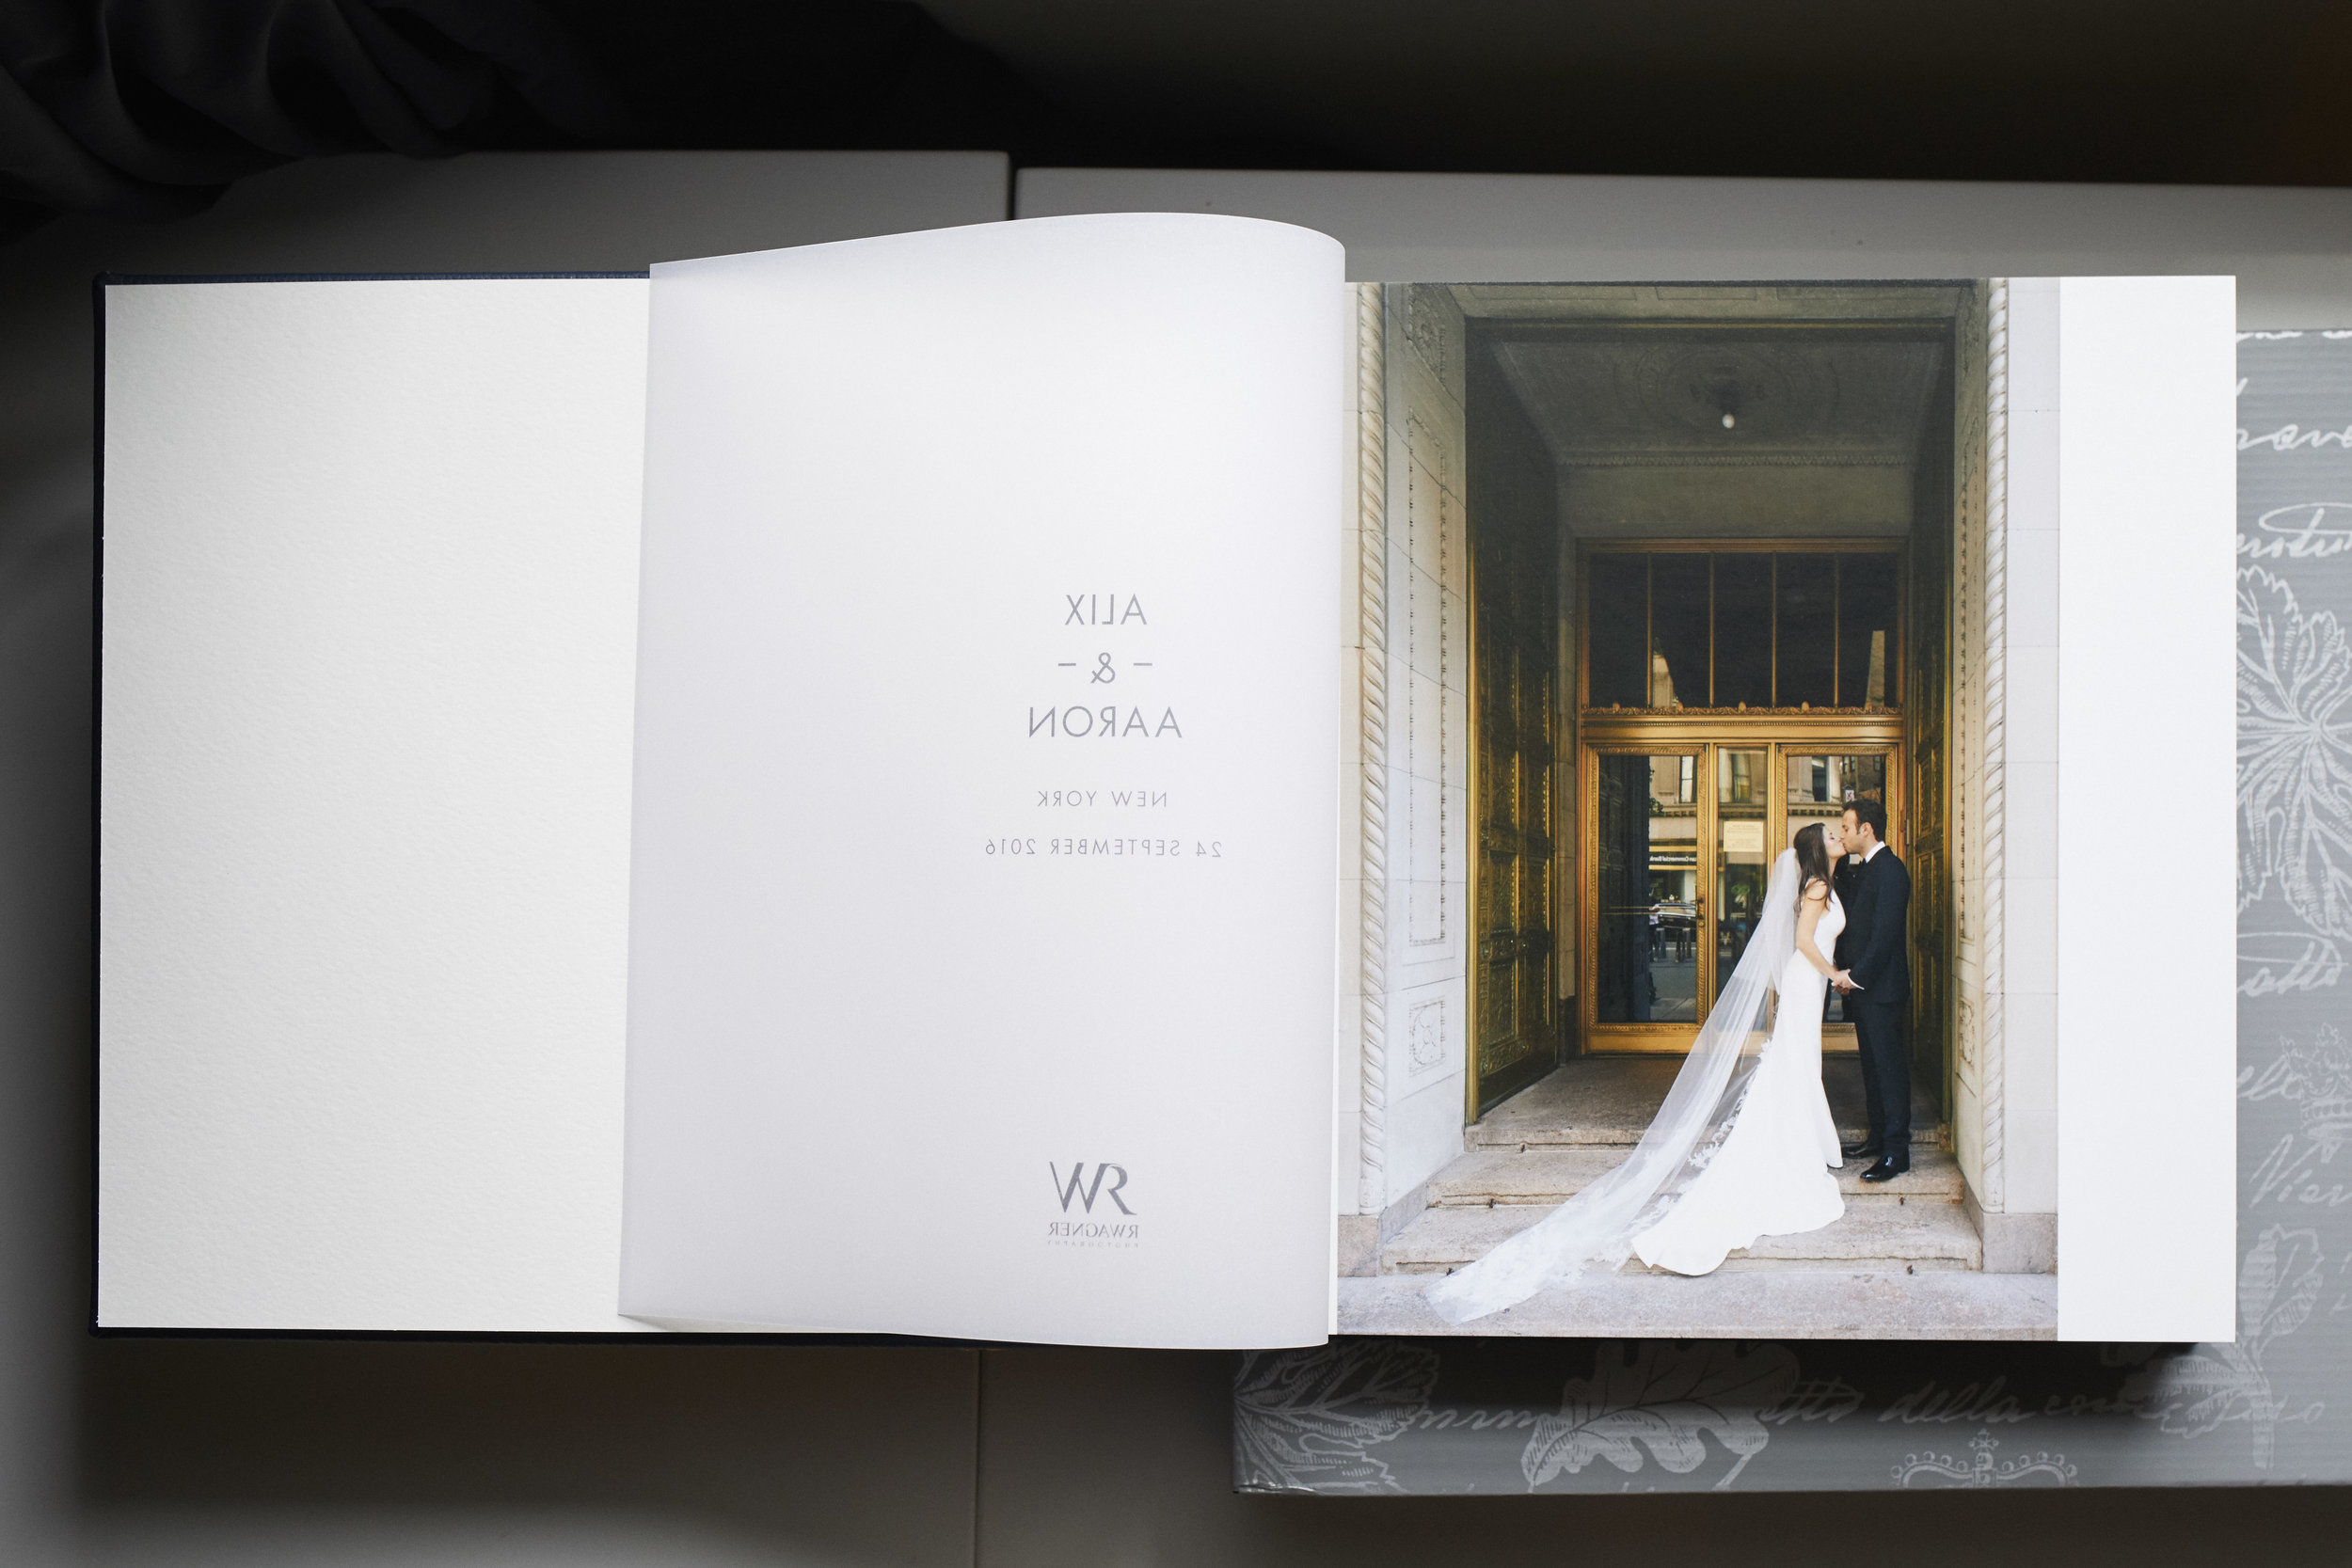 030_RWagner_Wedding_Album.jpg